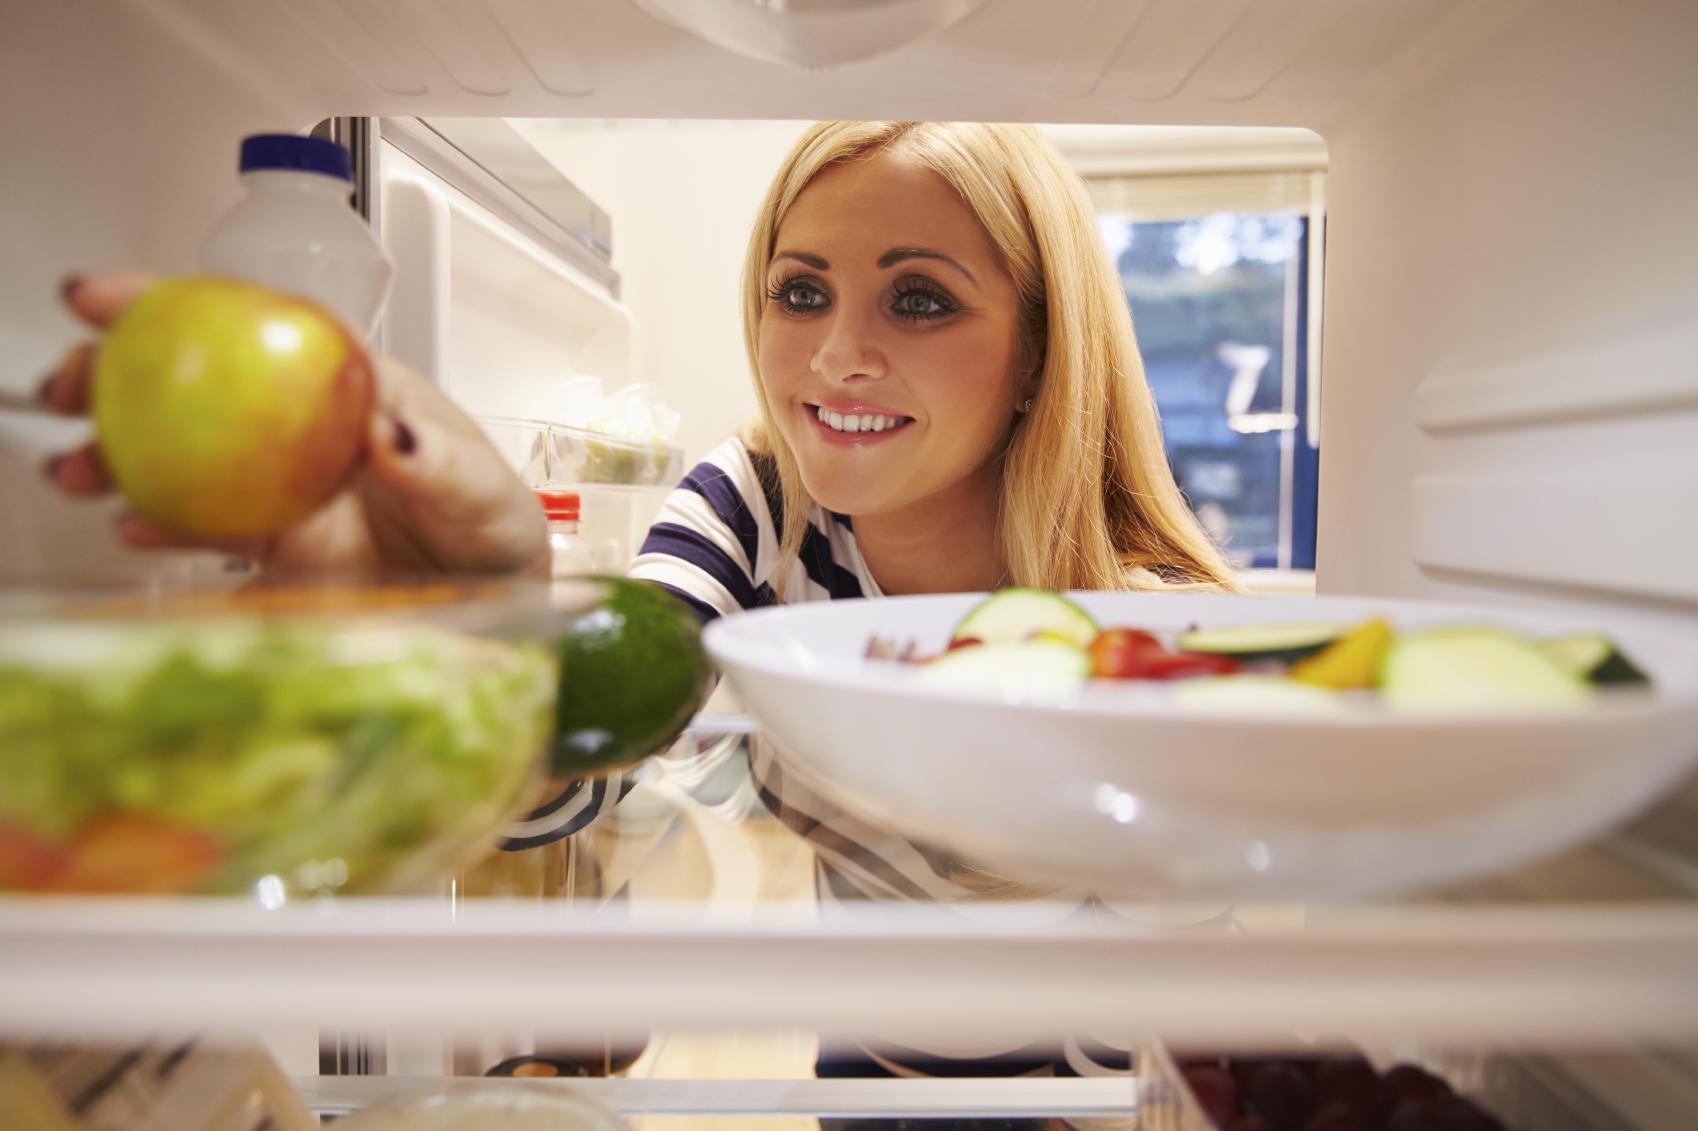 foods in fridge main image